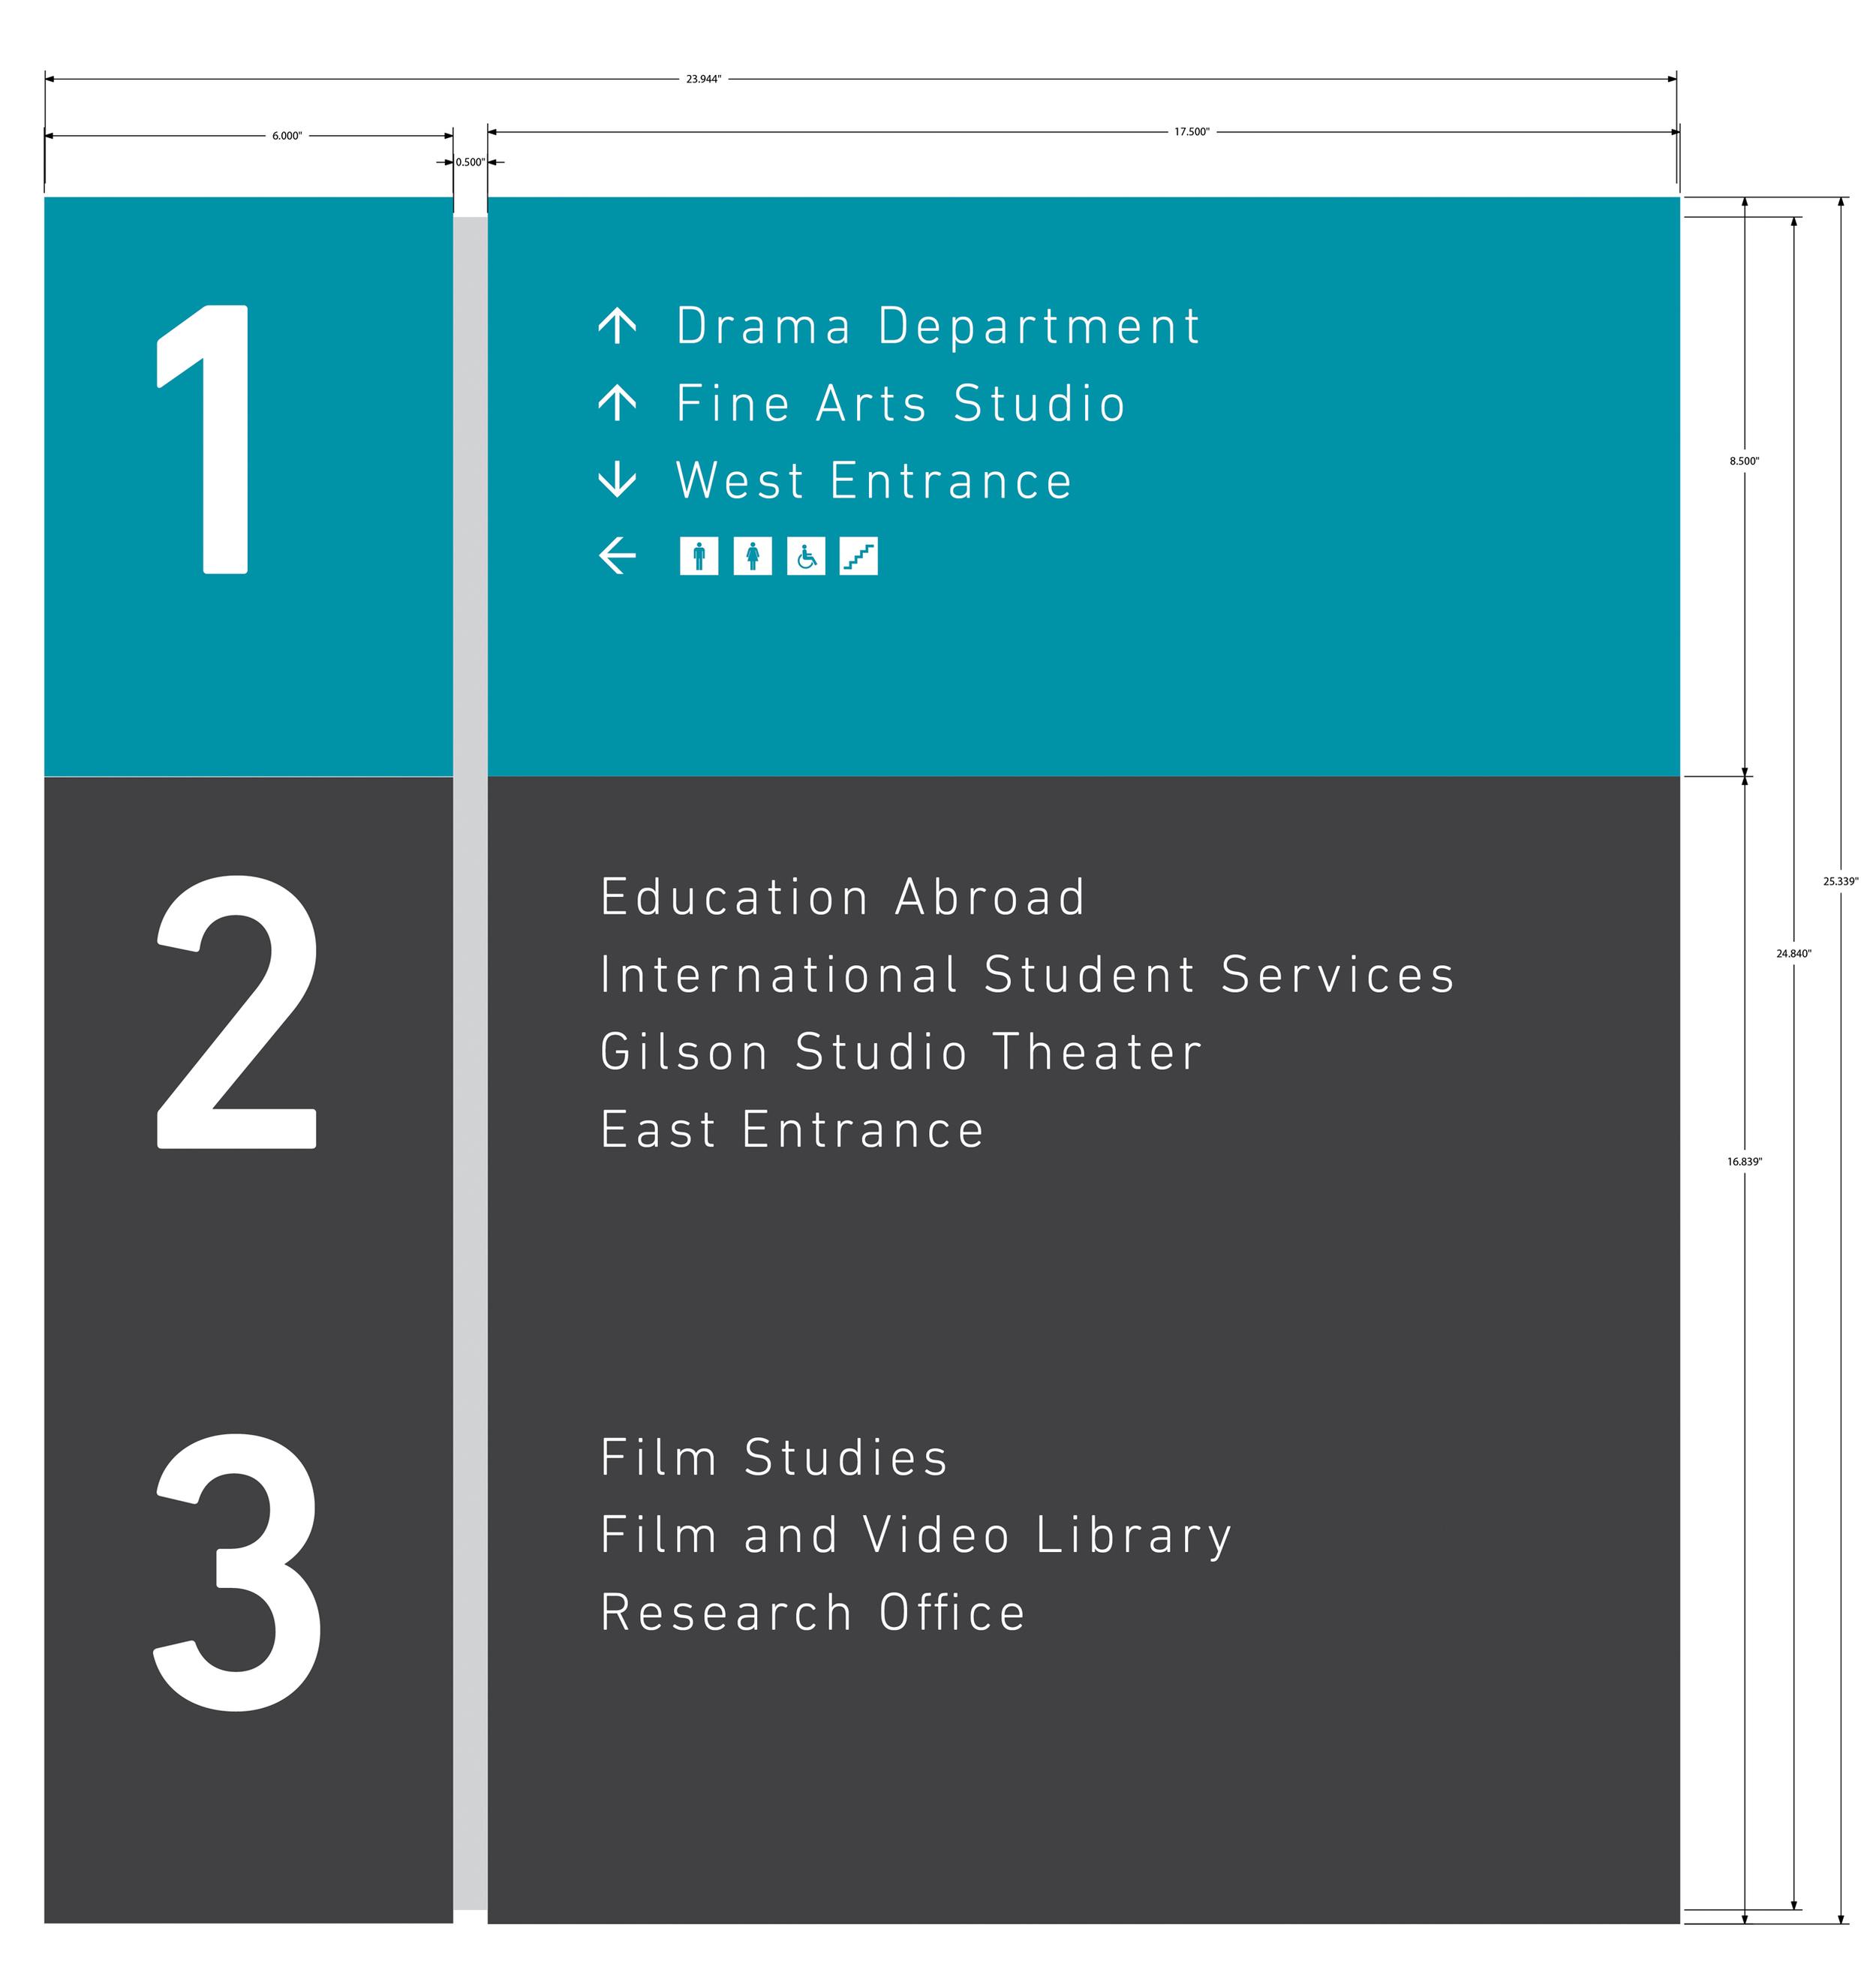 Floor Directory/Wall Directional